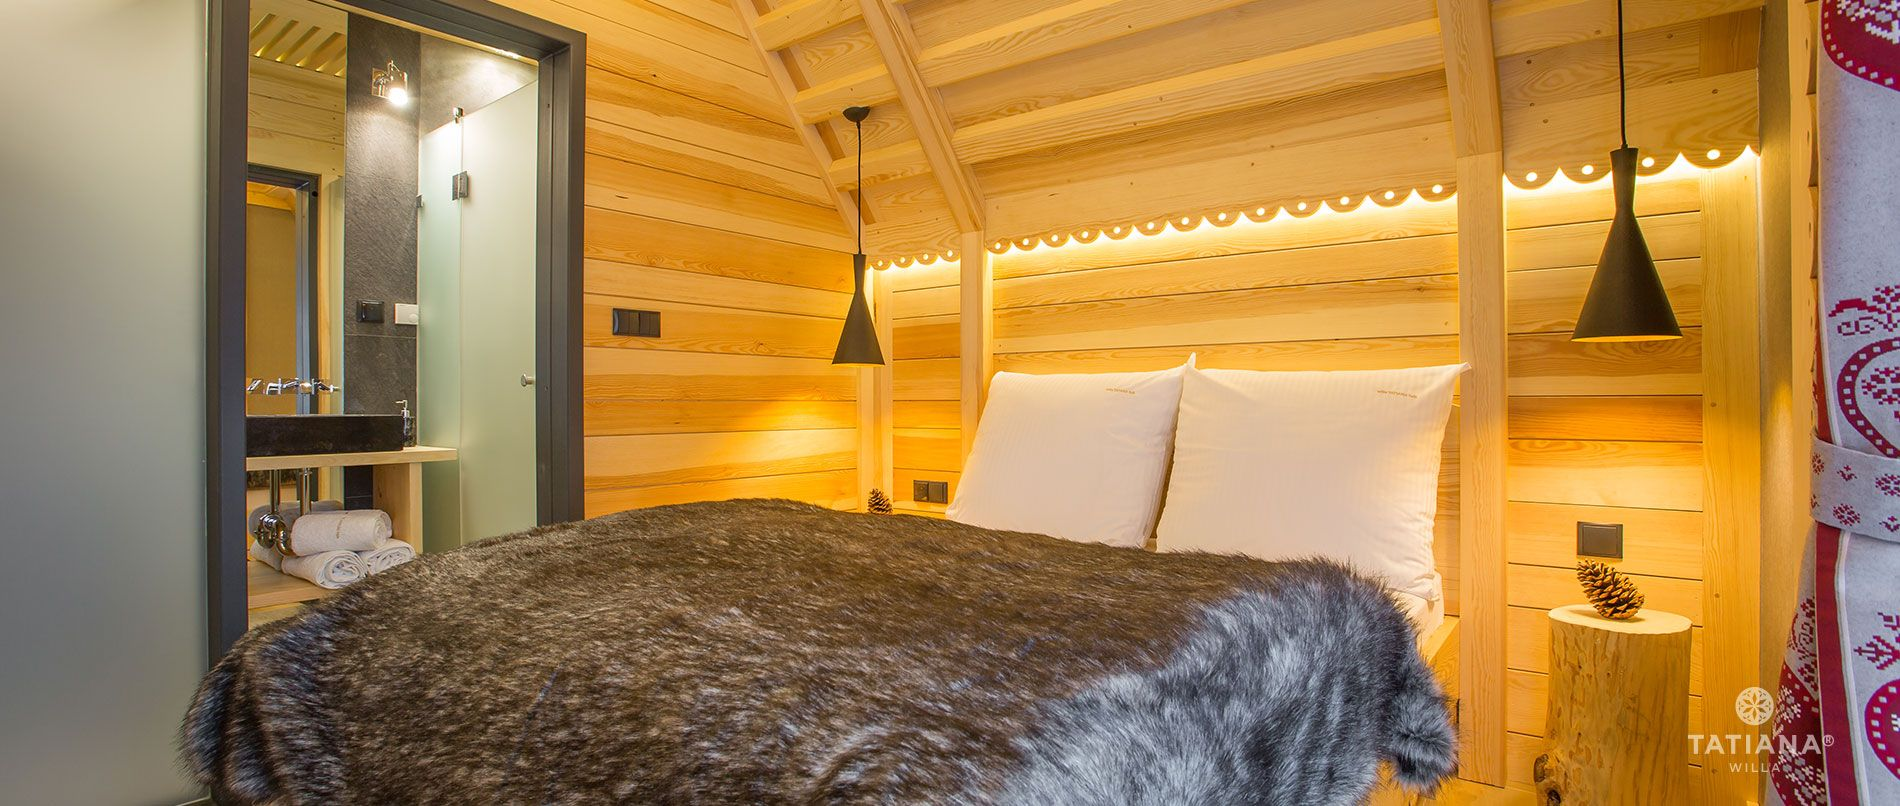 Apartament Alpejski - sypialnia